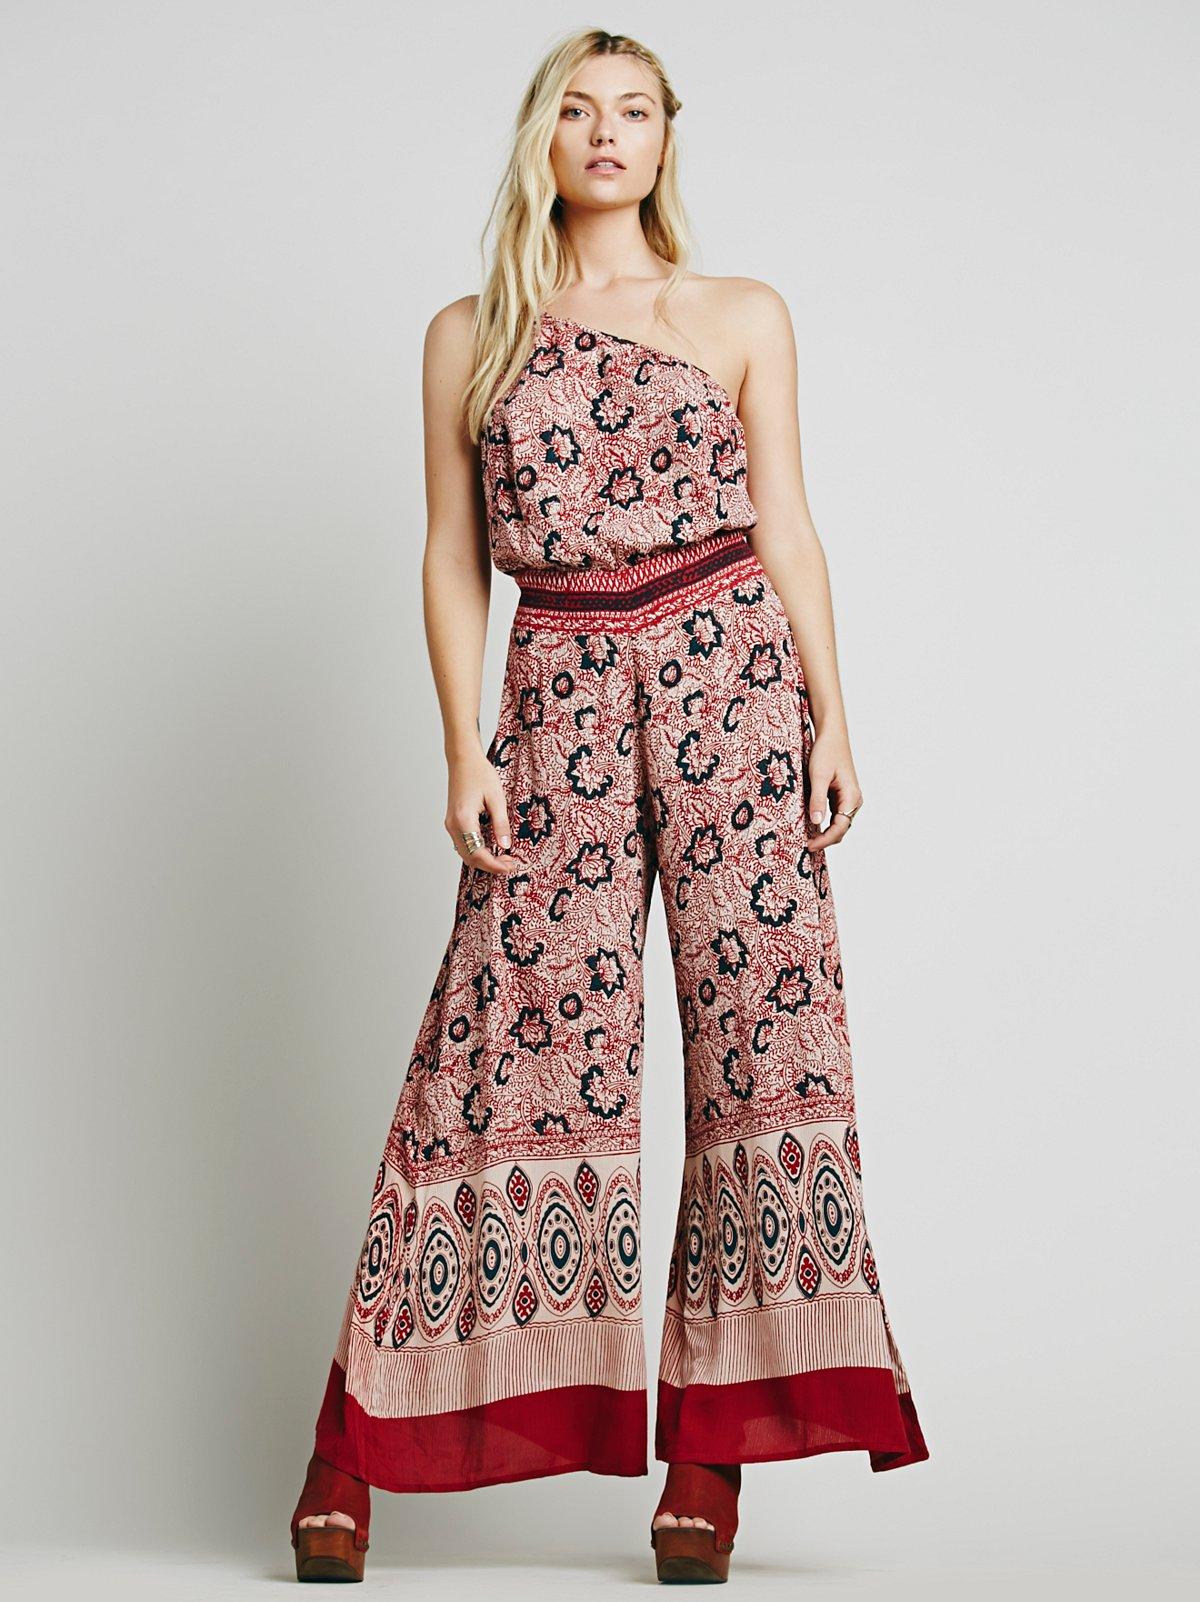 Bali Lovina连体裤